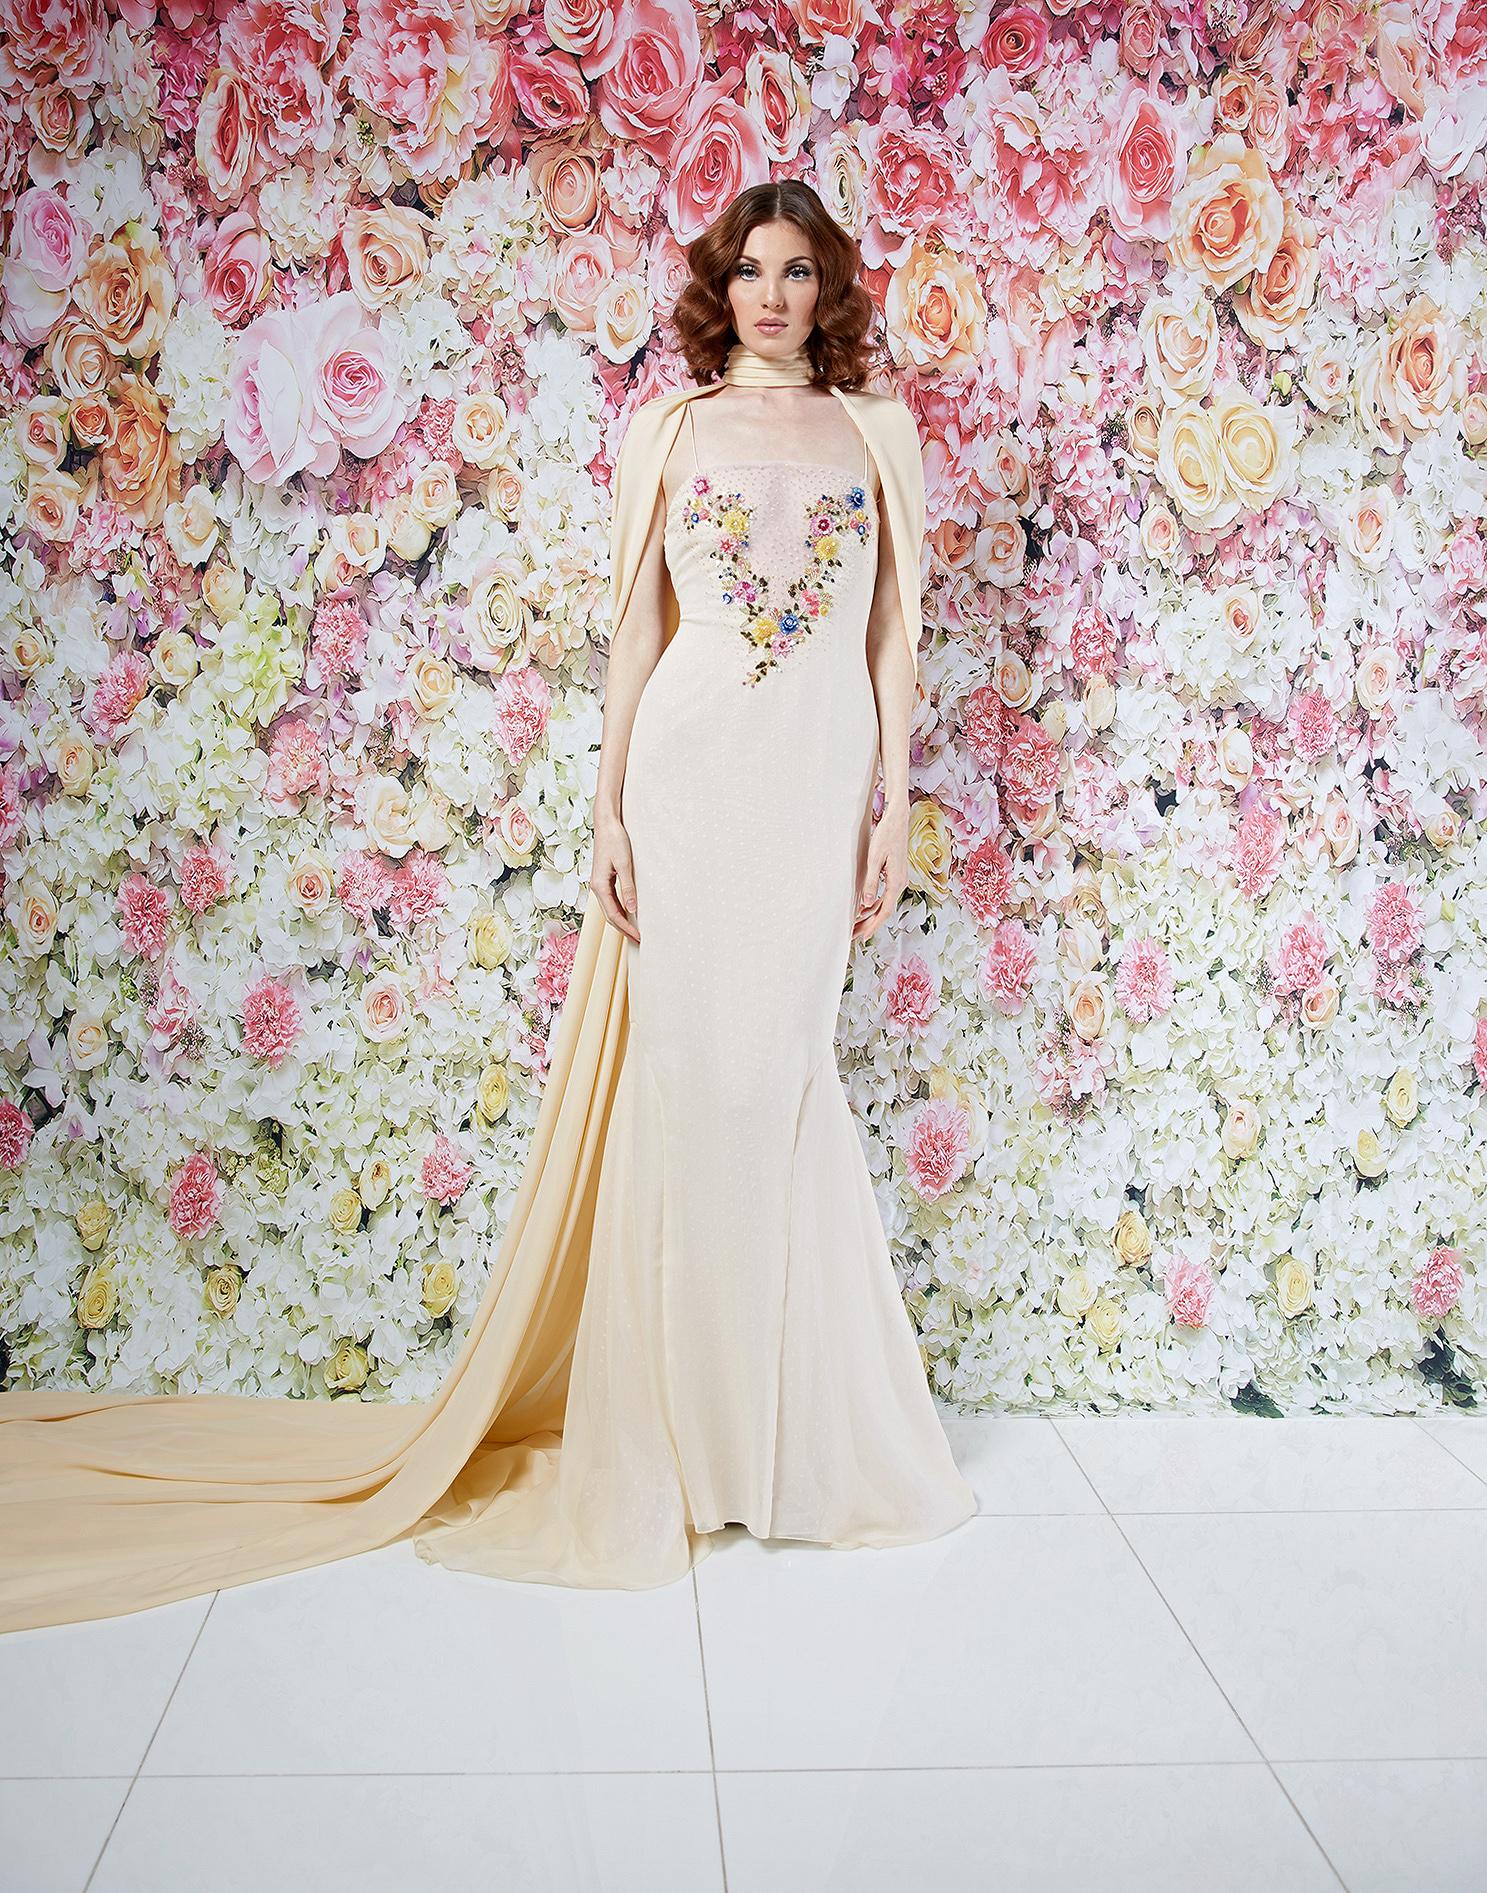 randi rahm wedding dress spring 2019 mermaid spaghetti-strap ties